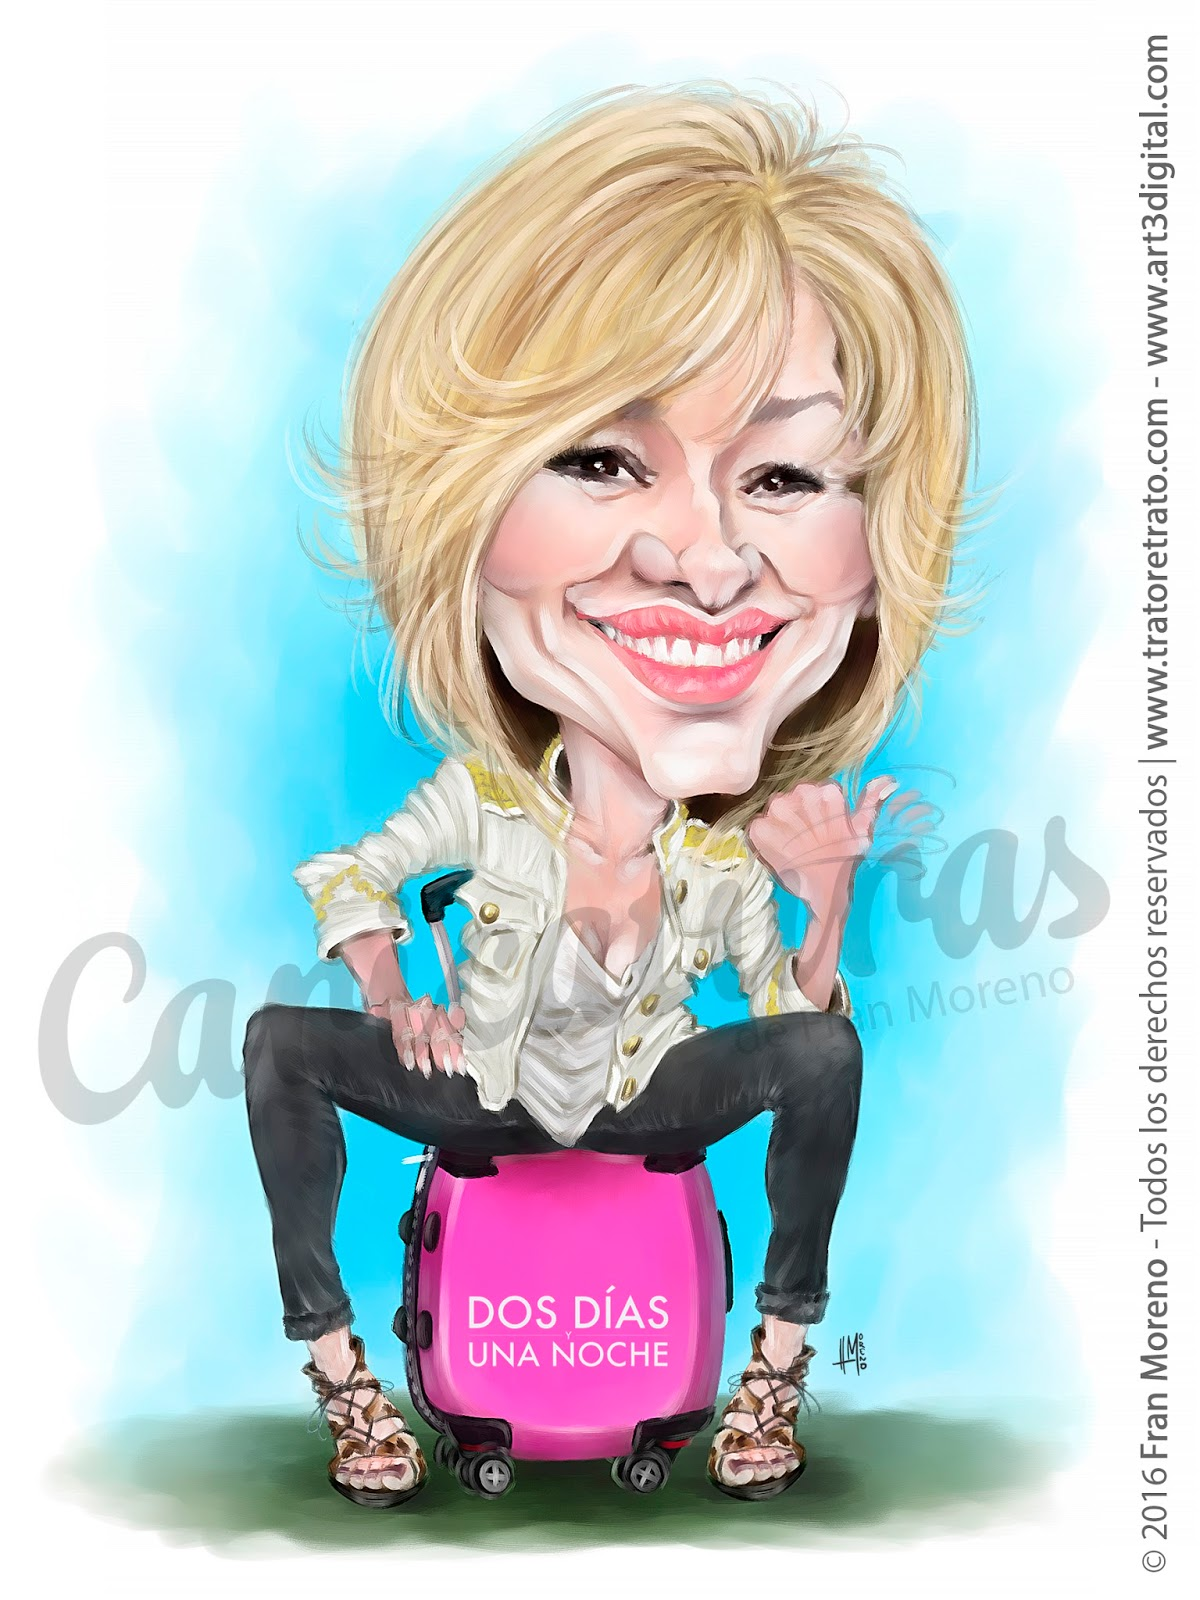 Caricatura de Susanna Griso por Fran Moreno